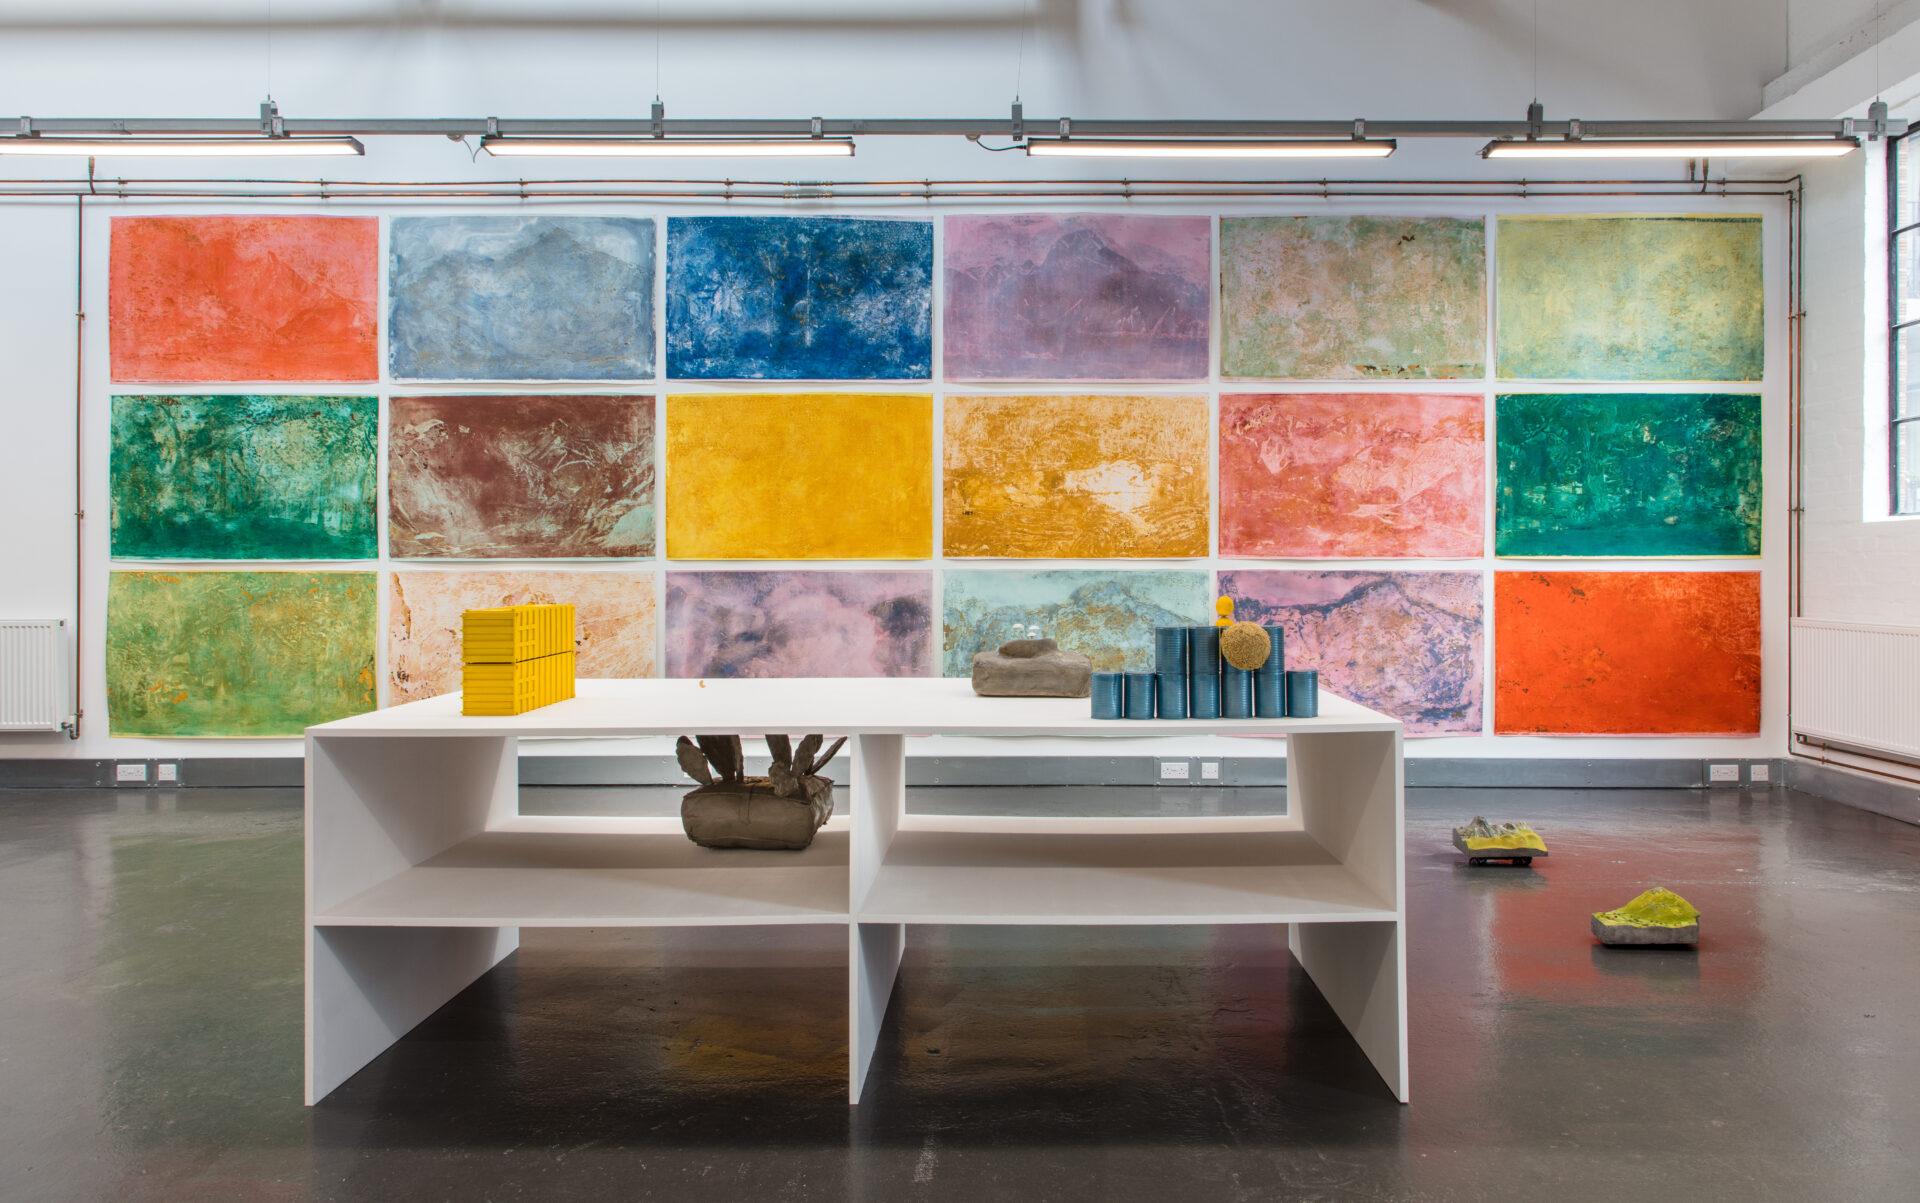 Elizabeth Xi Bauer exhibition art gallery The Garden of Unearthly Delights